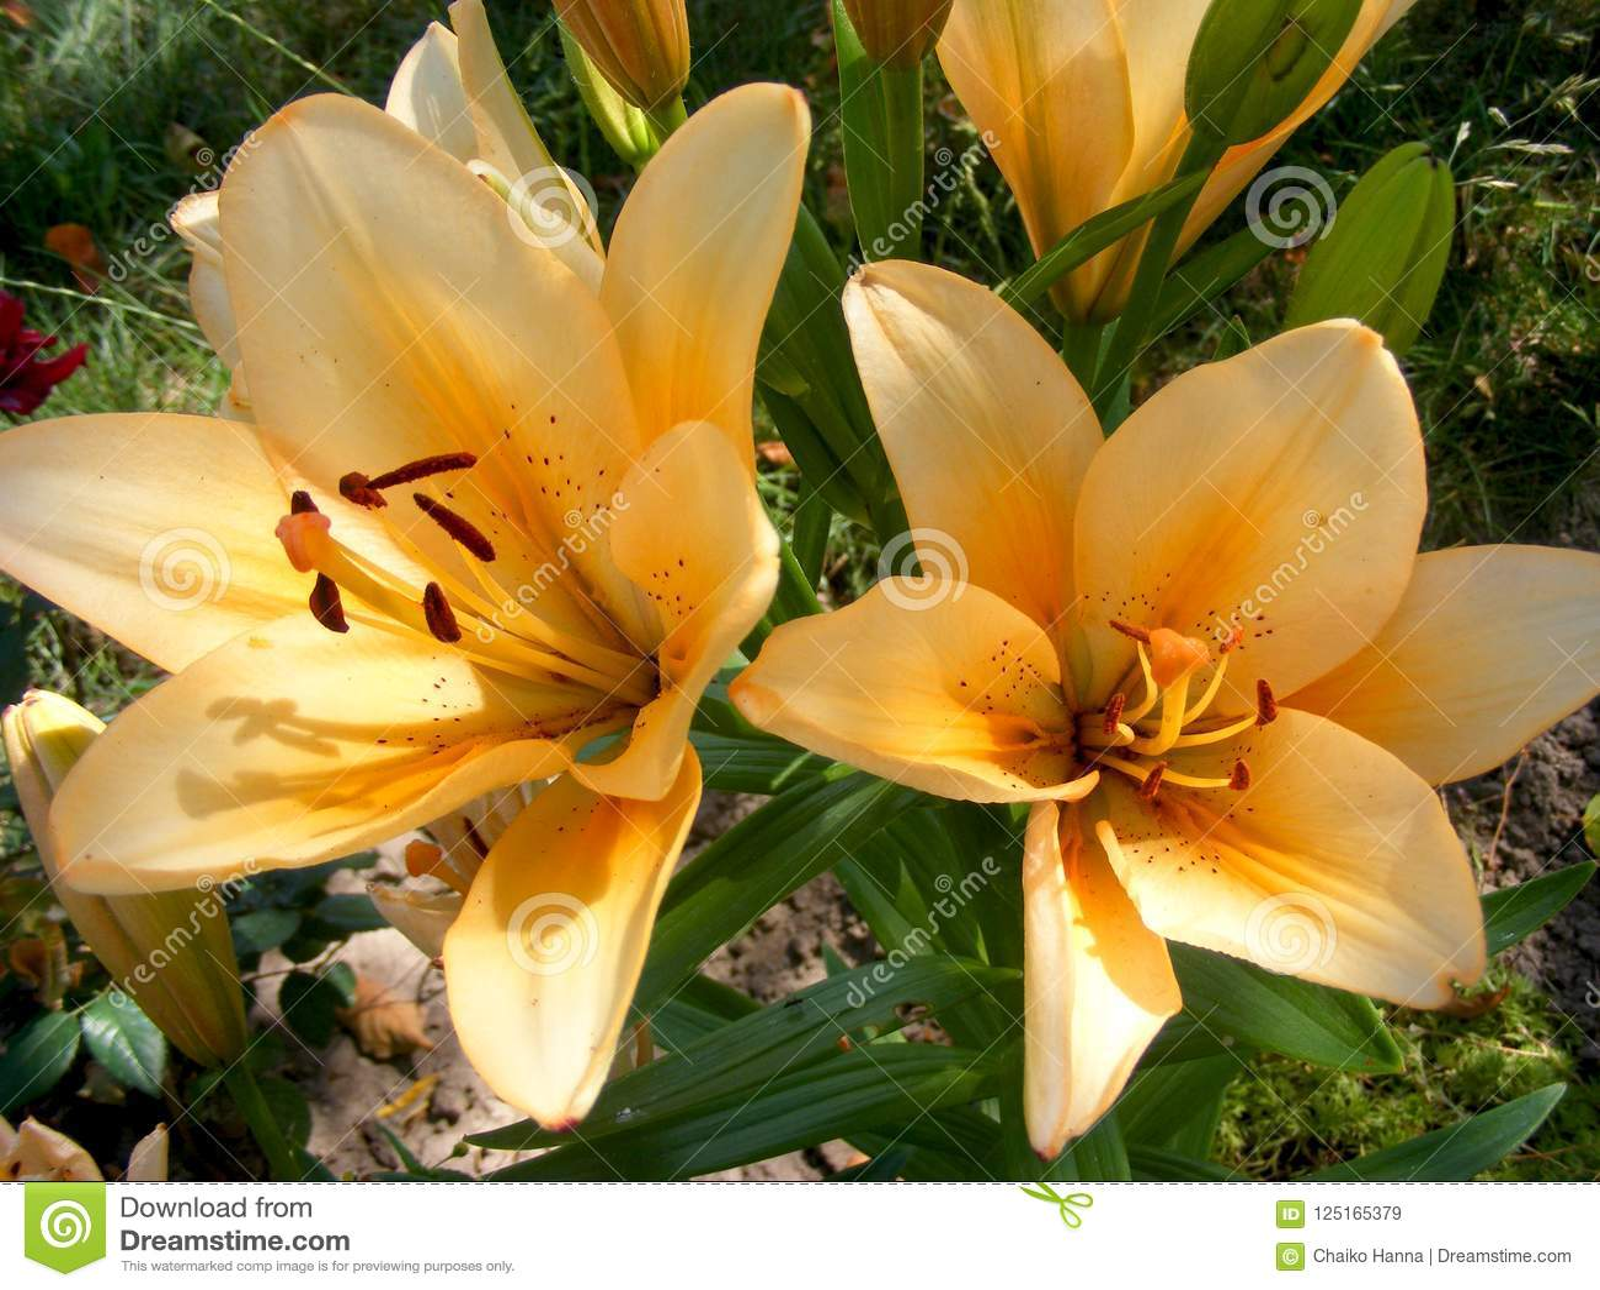 Yellow Lily Flower Natural Flower Background Flower Garden Stock